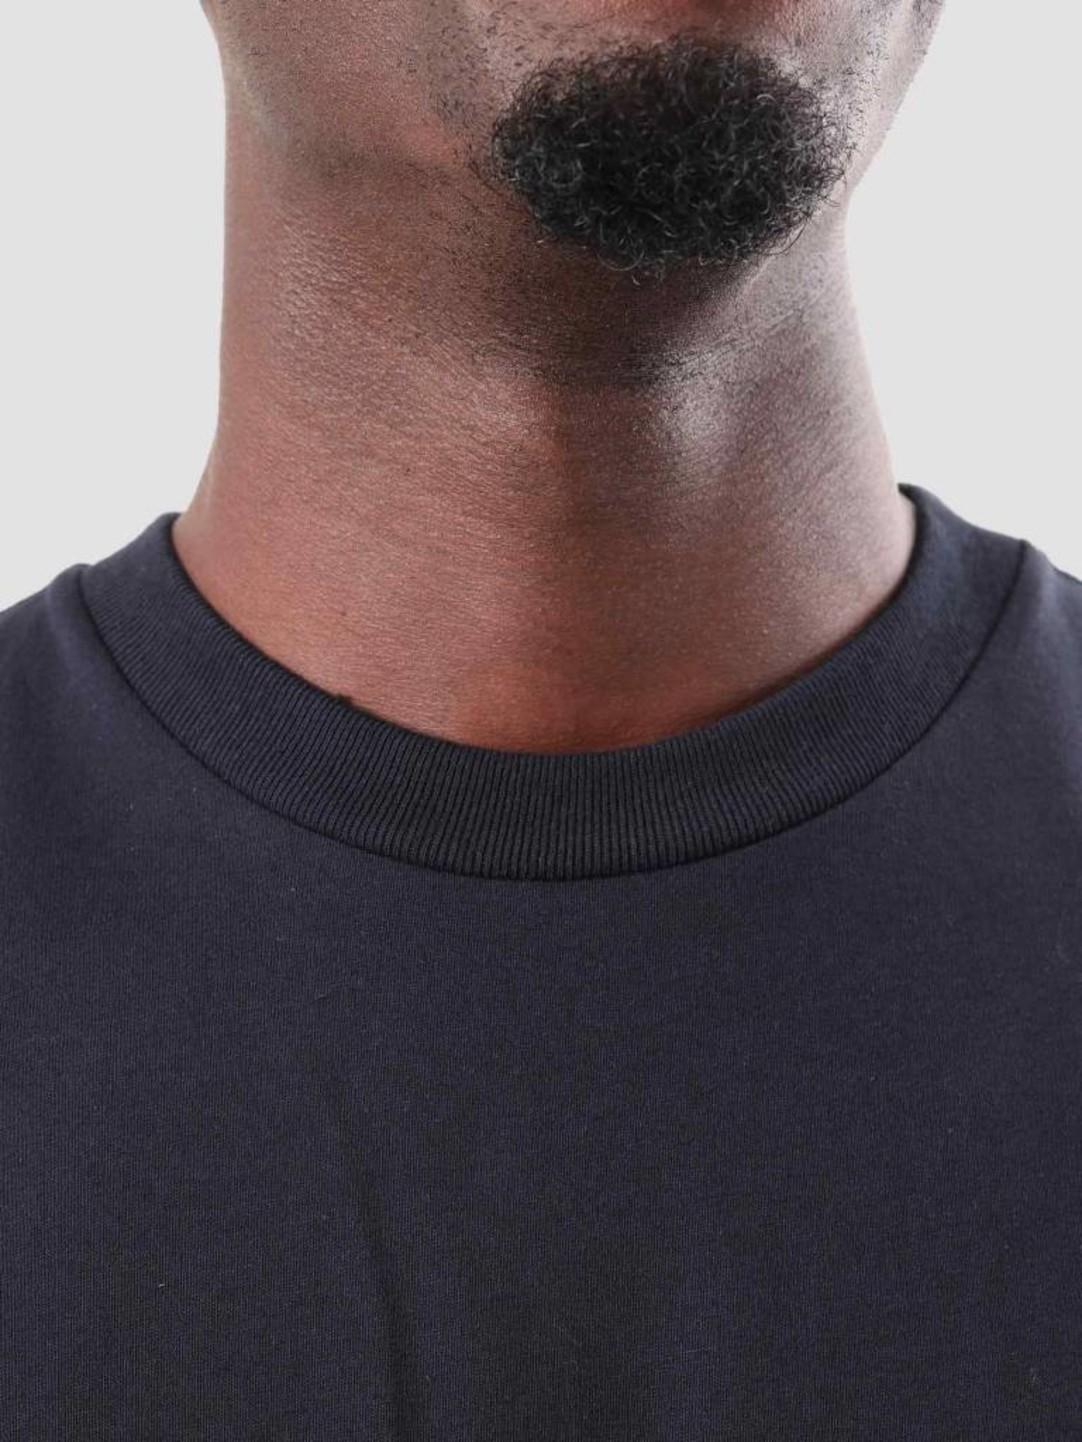 Carhartt WIP Carhartt WIP American Script T-Shirt Dark Navy I025711-1C00